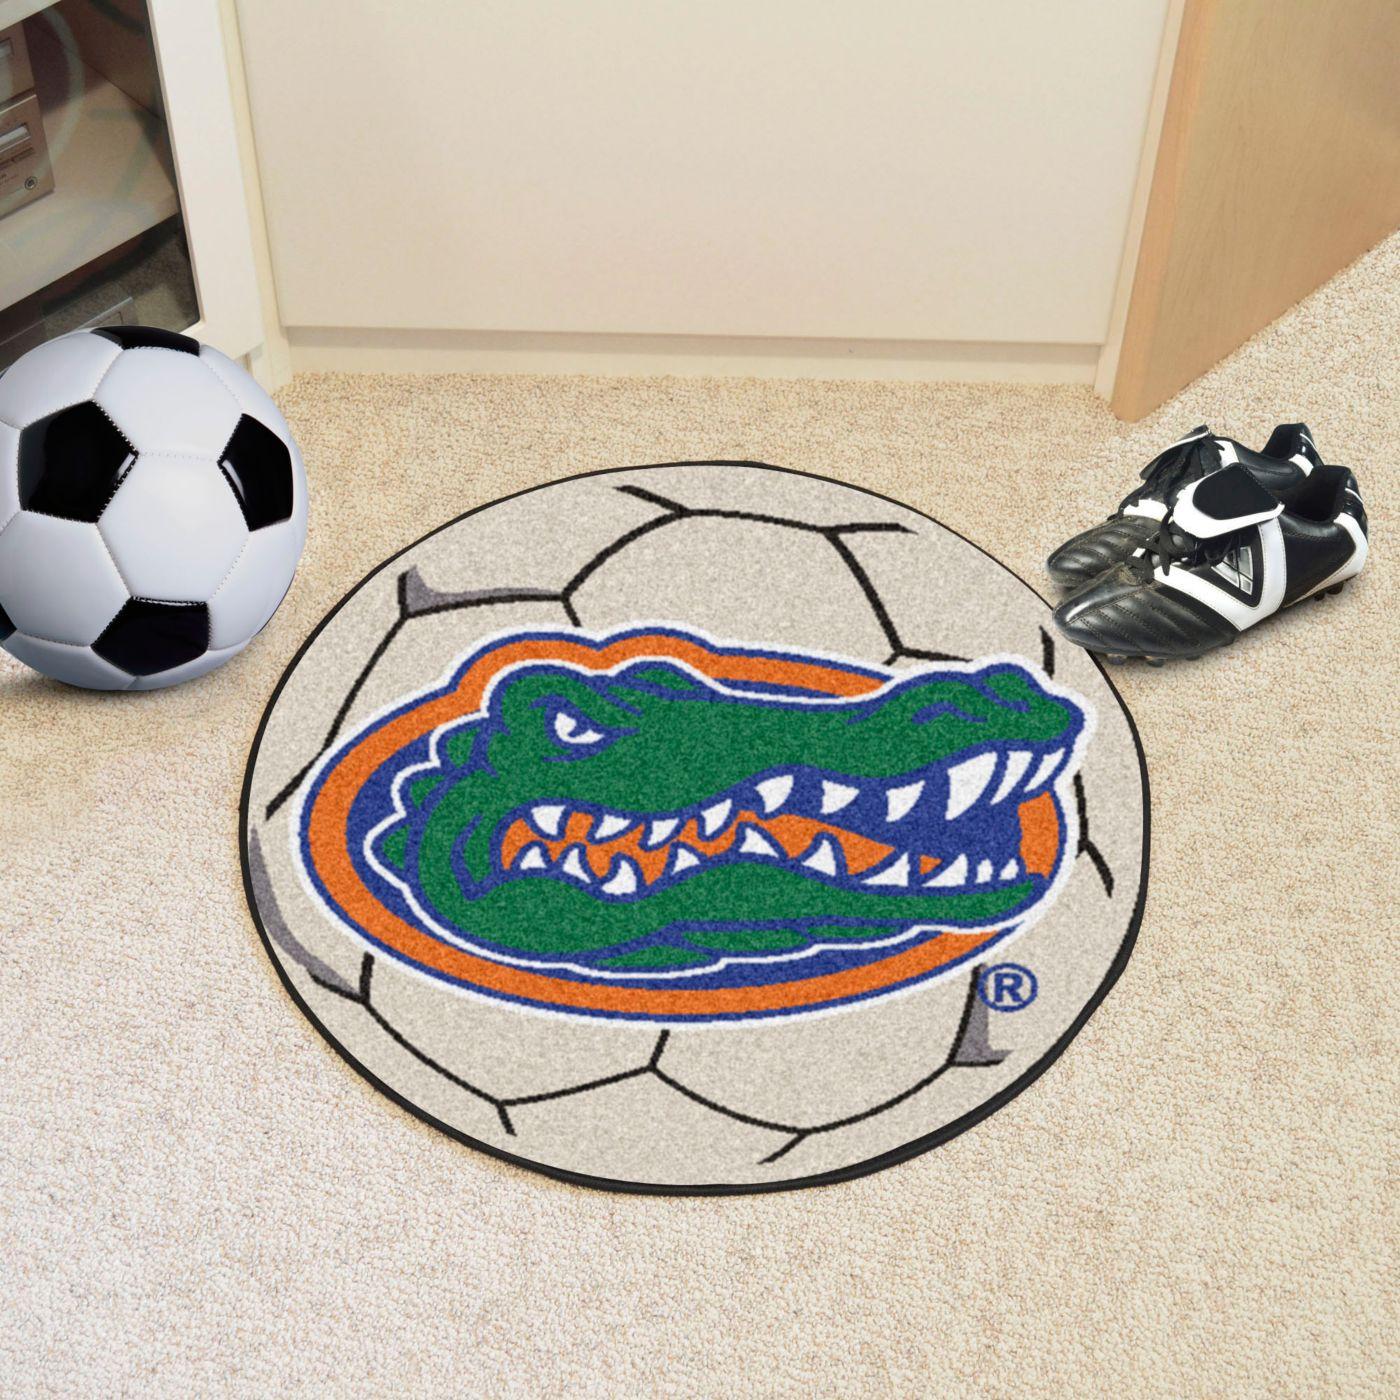 FANMATS Florida Gators Soccer Ball Mat